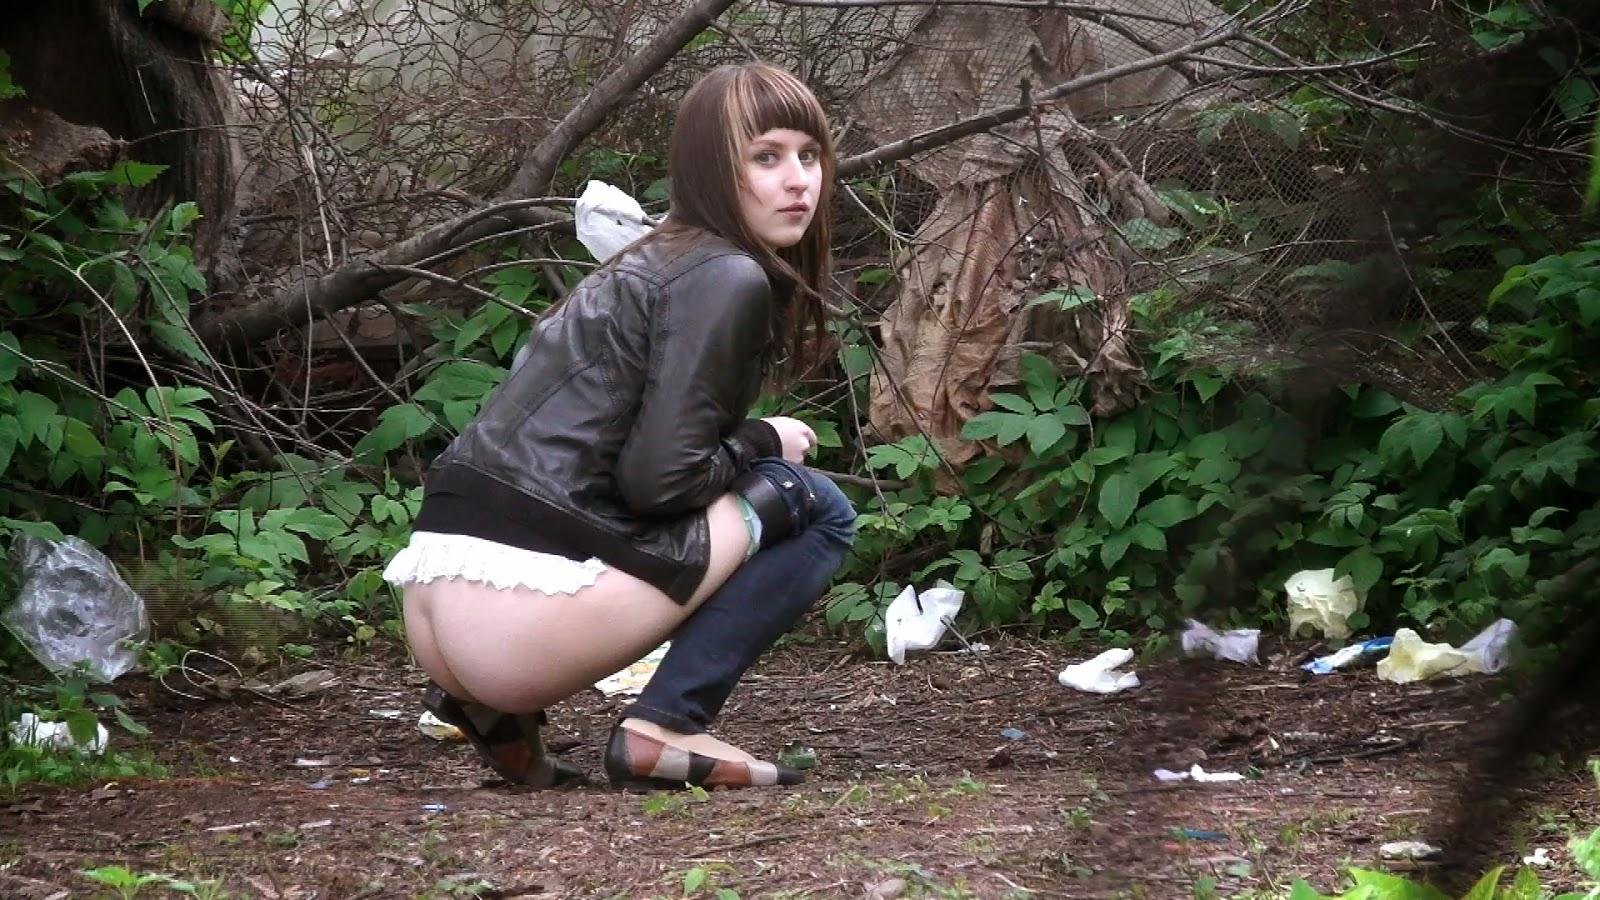 фото девушки писают в кустах регулярности нет,муж